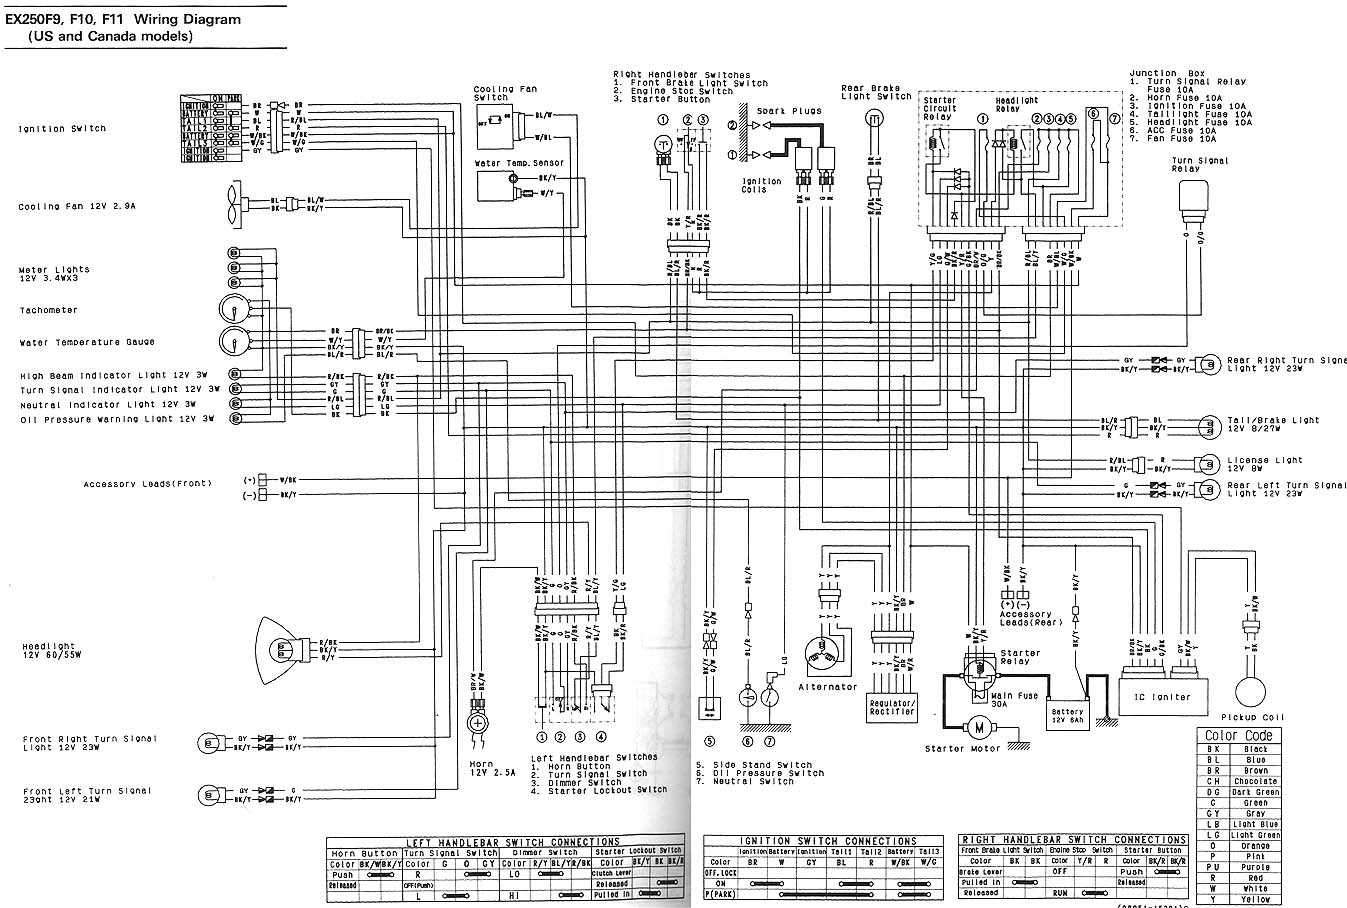 2007 kawasaki ninja zx6r wiring diagram box wiring diagram rh 18 20 loprt flottmusik de